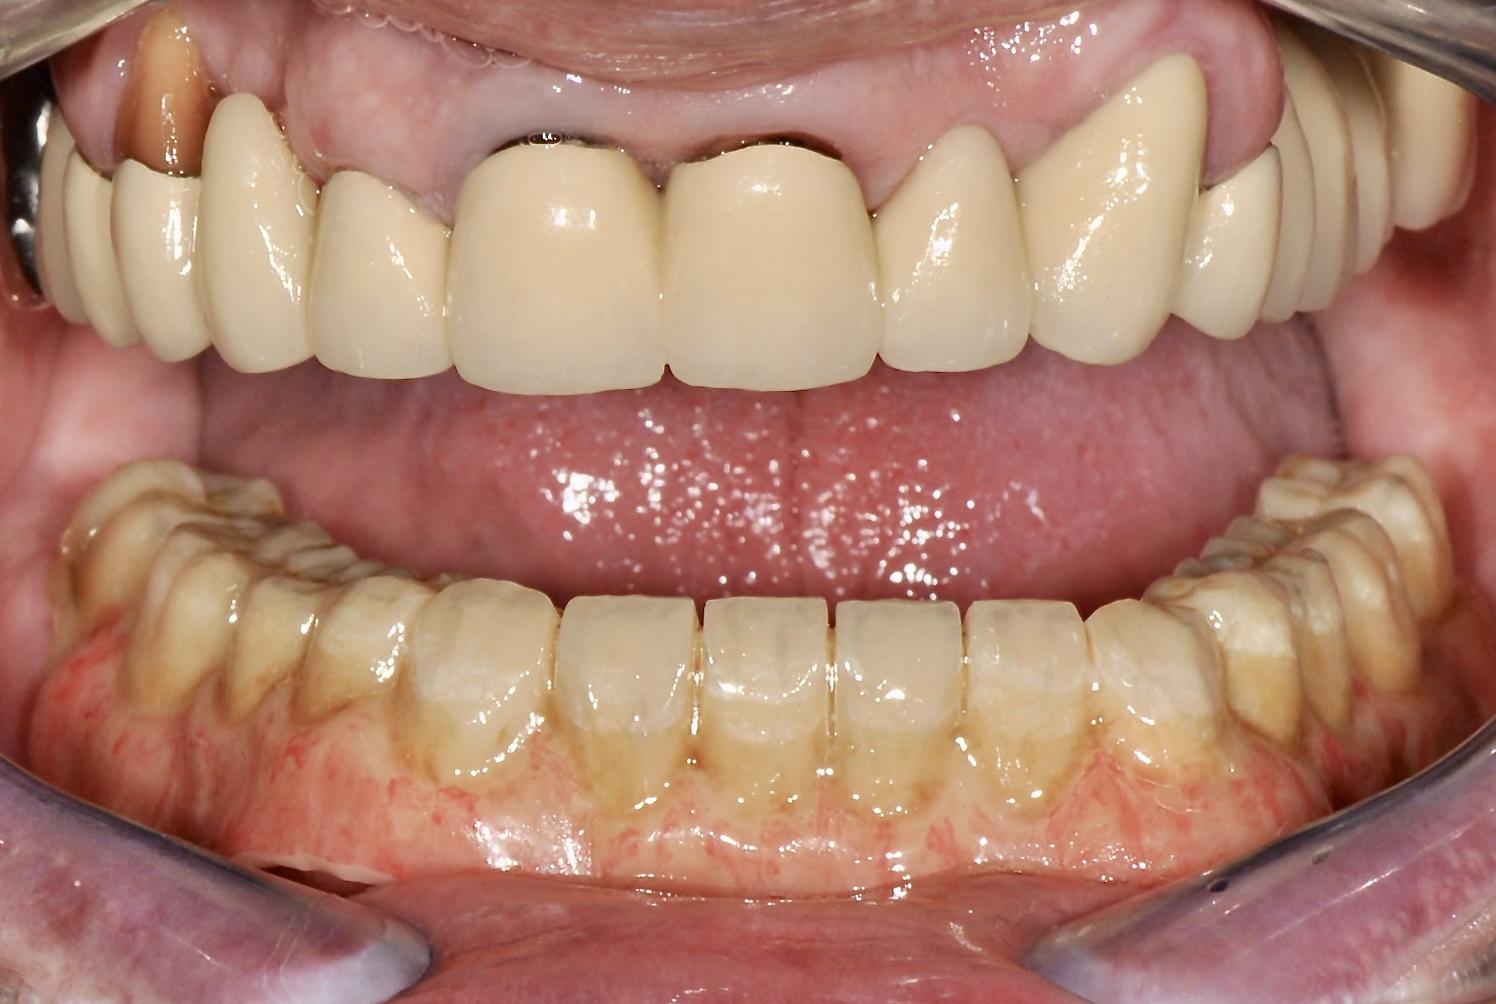 pmma-teleskopicka-zubni-nahrada-v-ustech